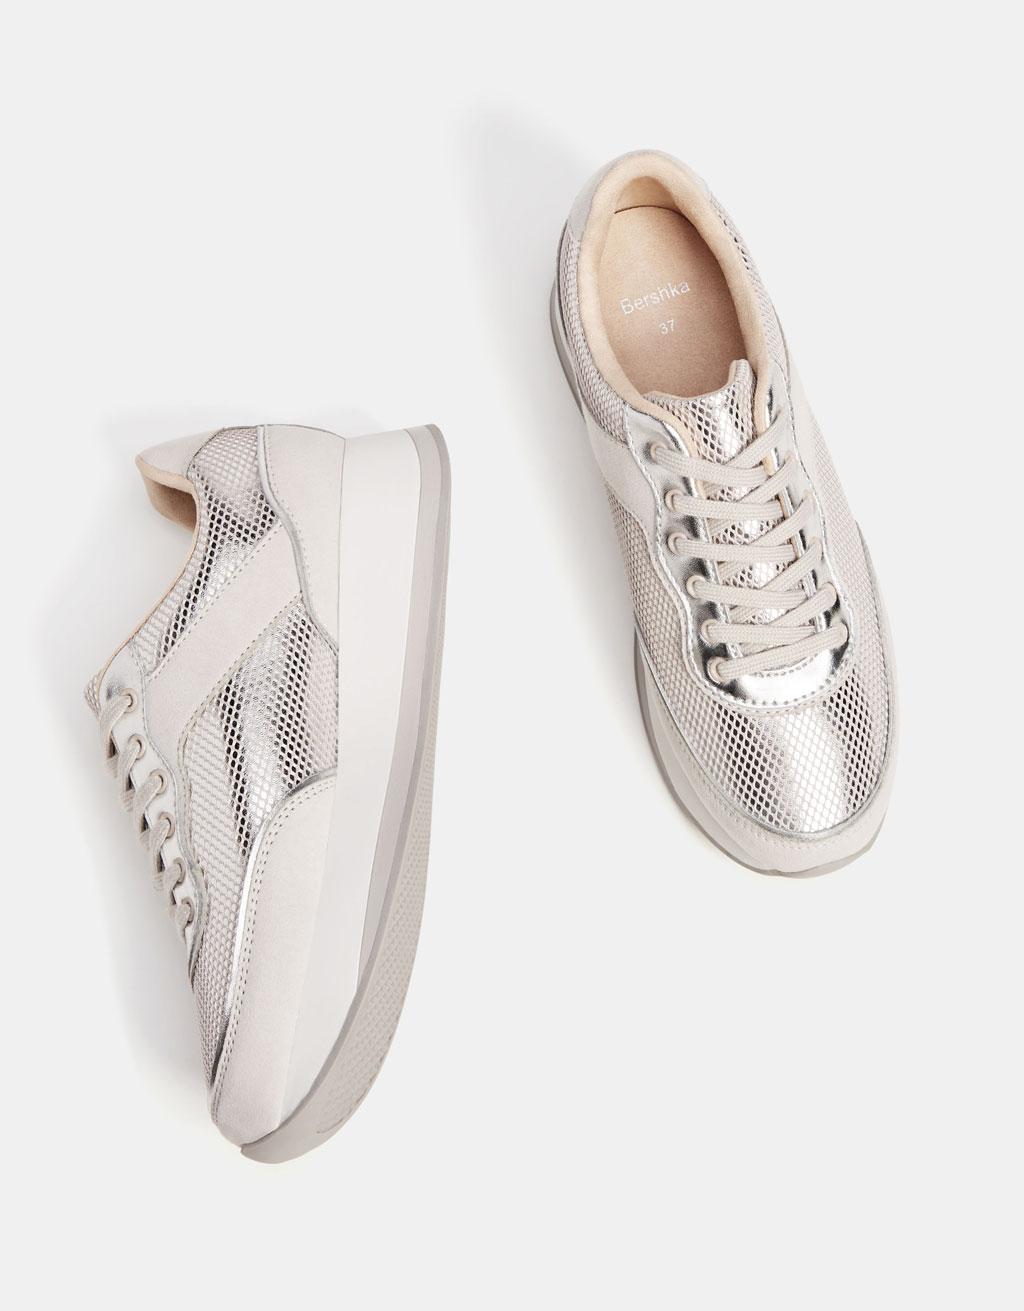 Grey contrasting sneakers